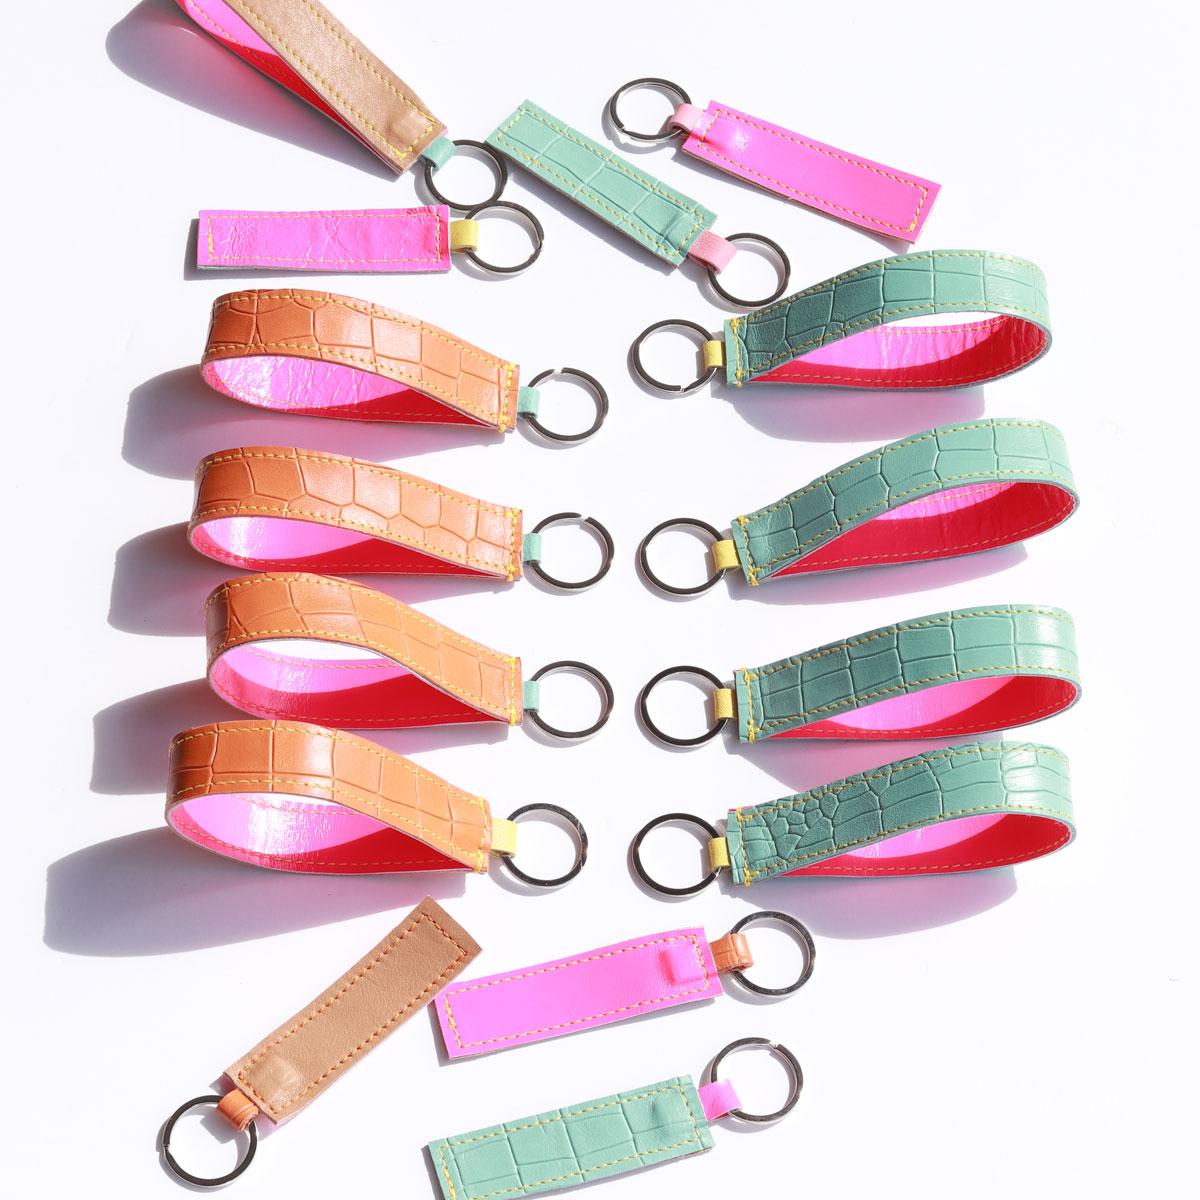 elfenklang schlüsselanhänger lederband kroko neon pink